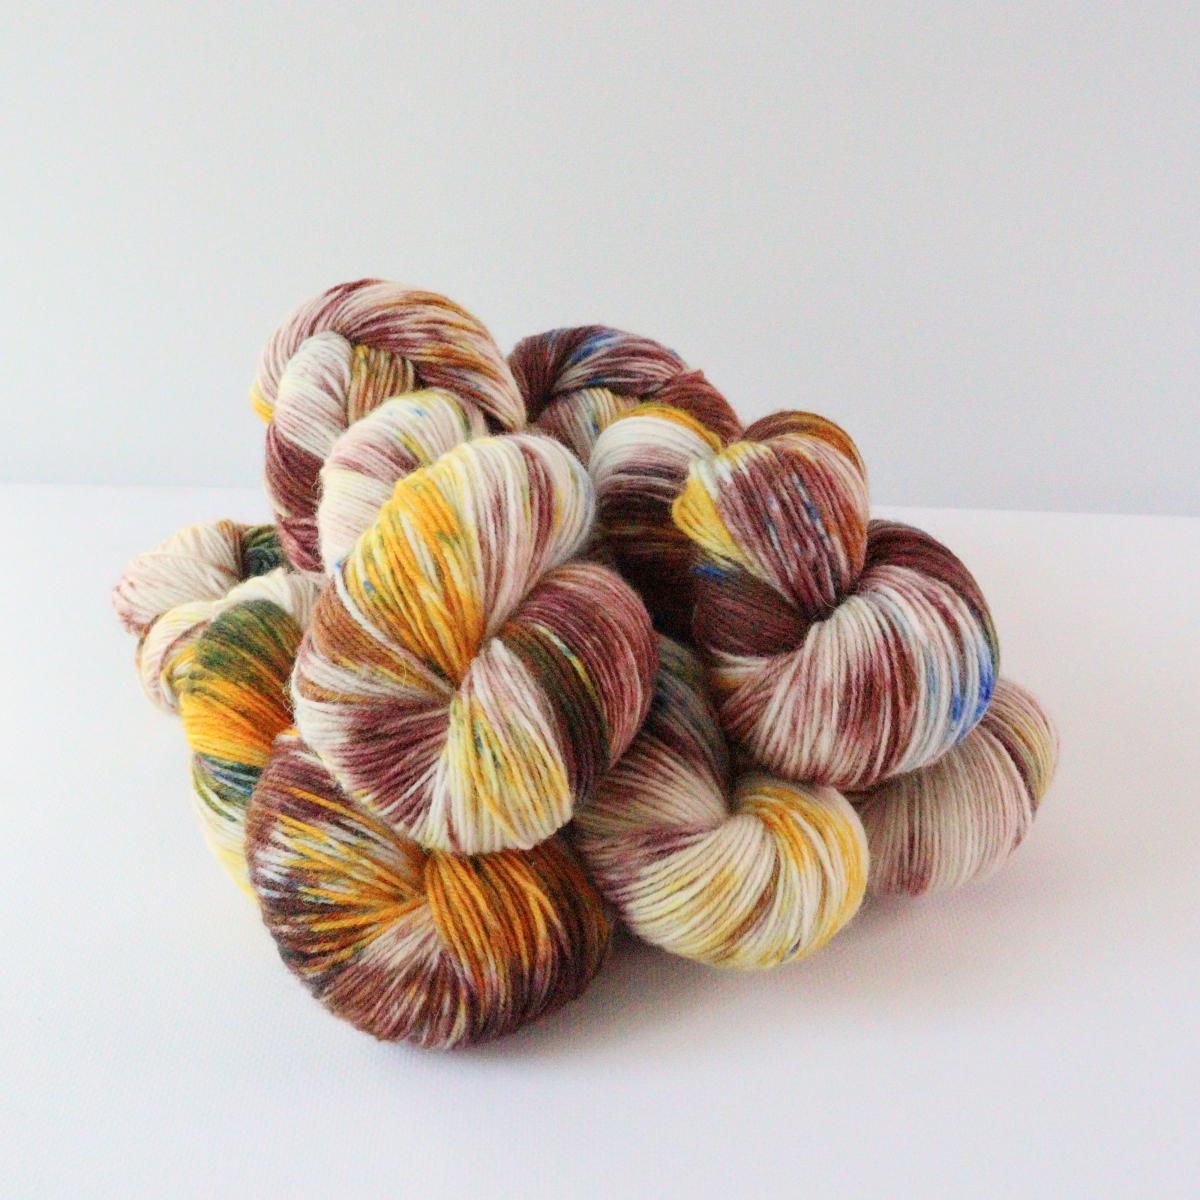 woodico.pro hand dyed yarn 089 1 1200x1200 - Hand dyed yarn / 089